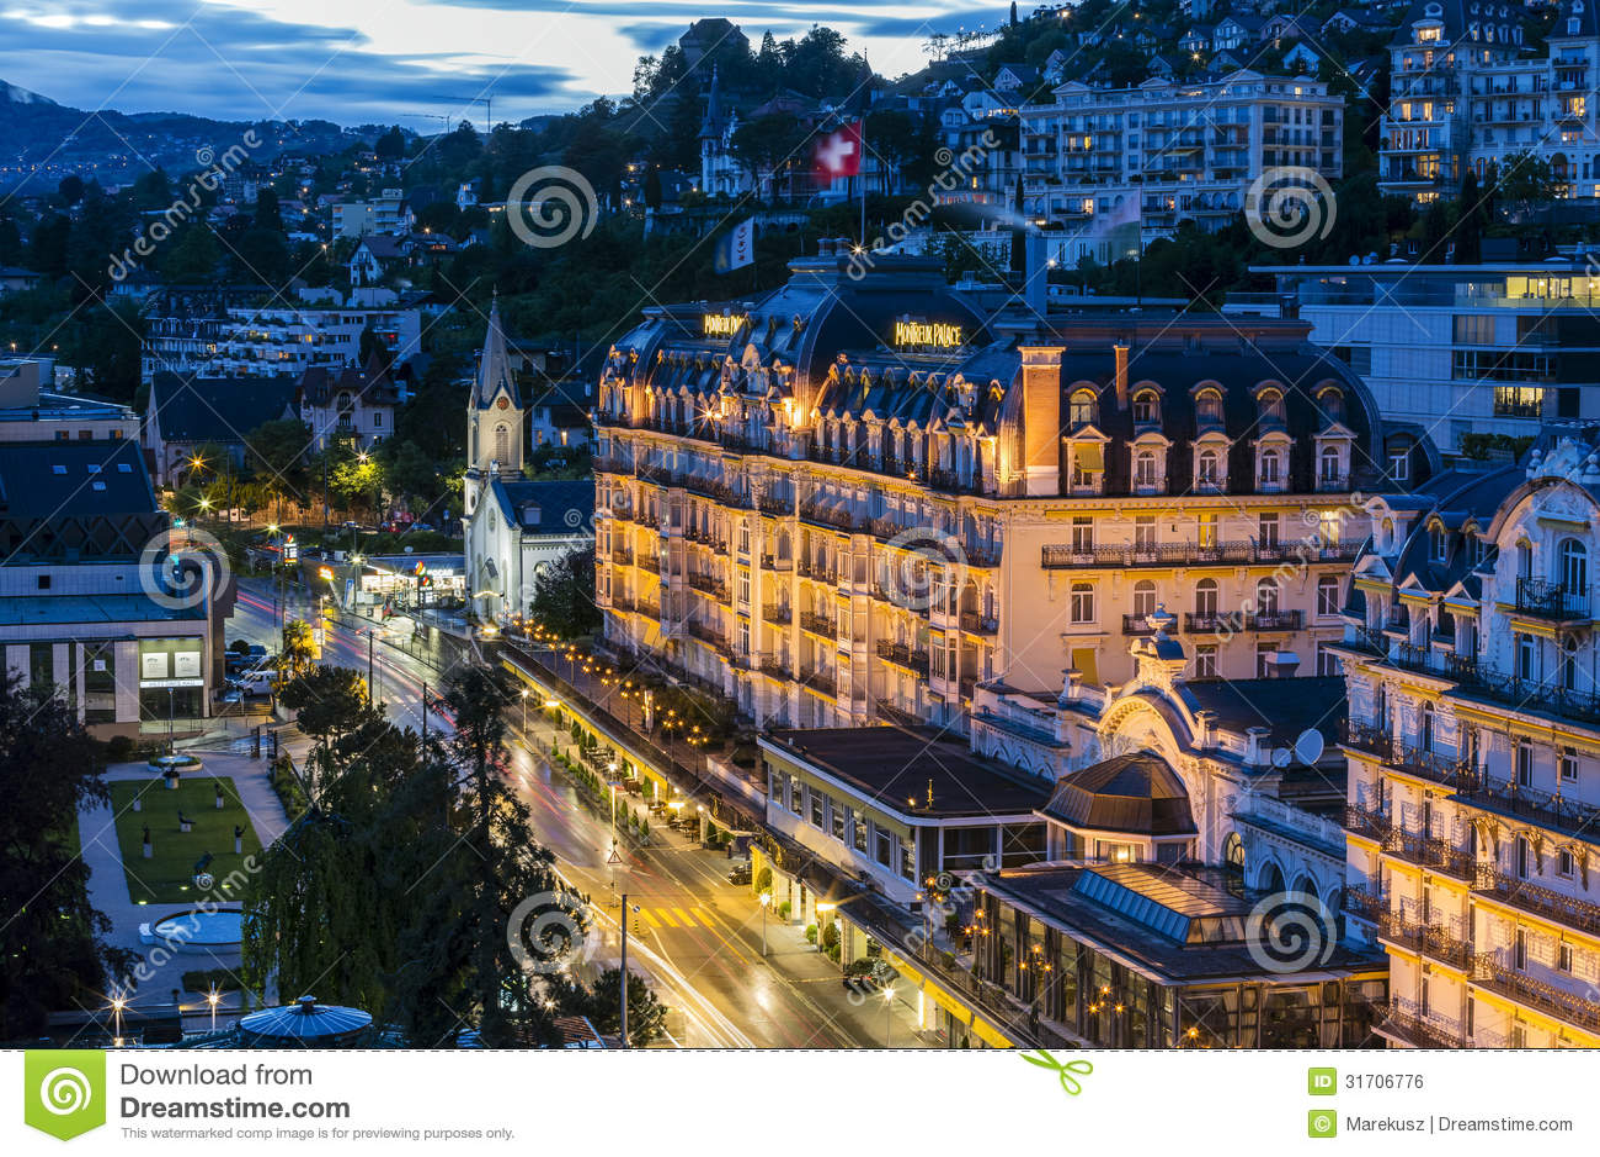 Montreux Palace Hotel